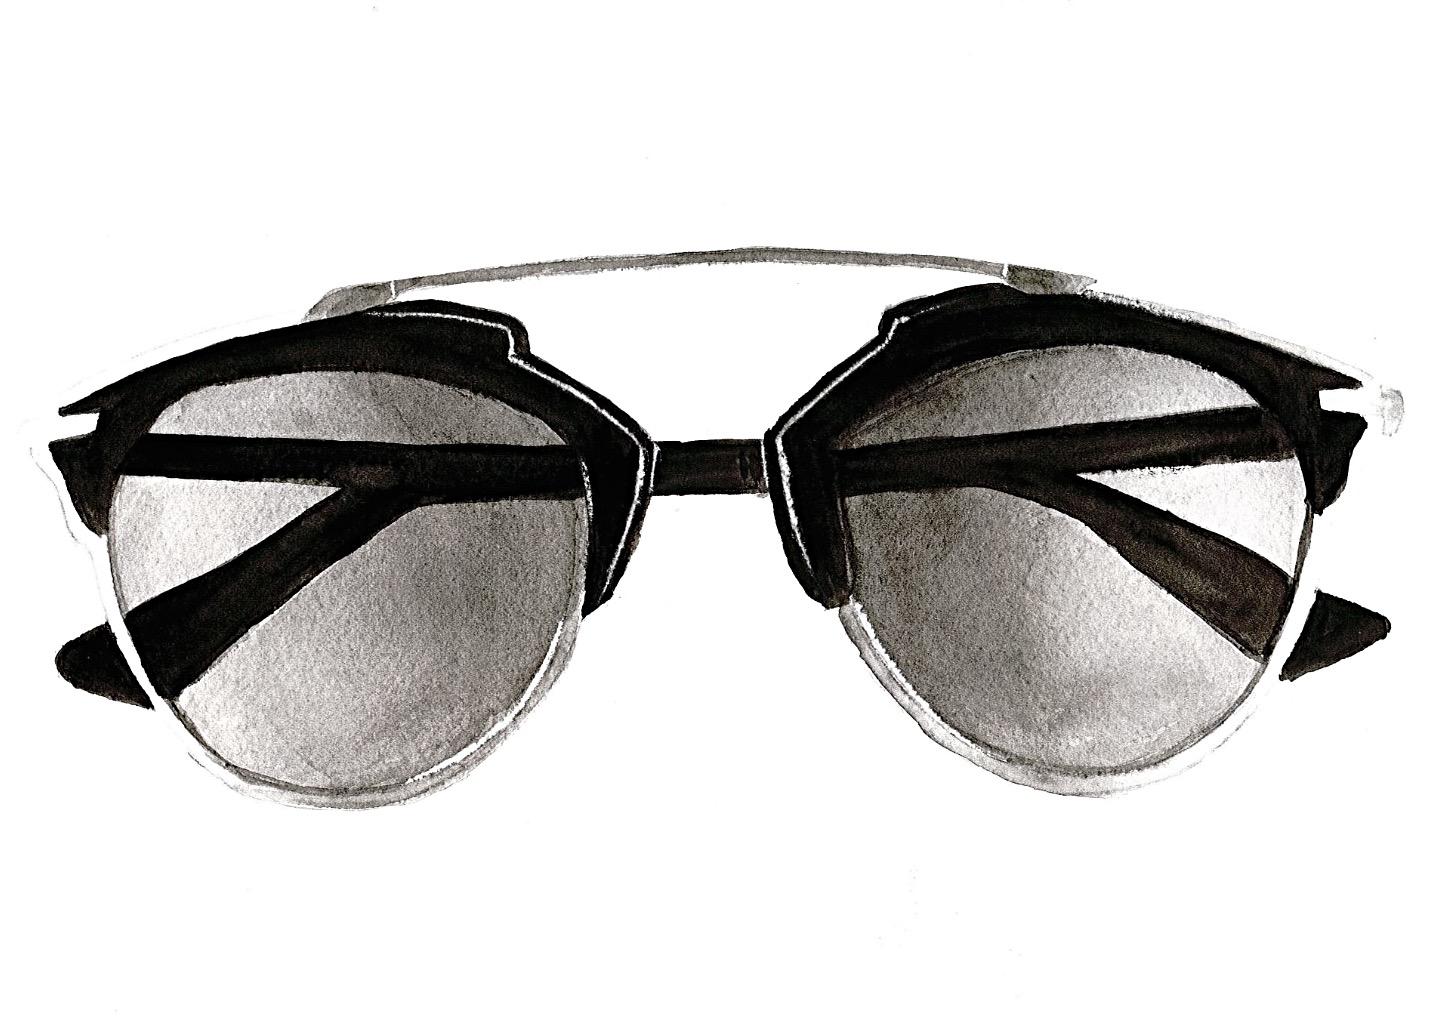 dior sunglasses_edited